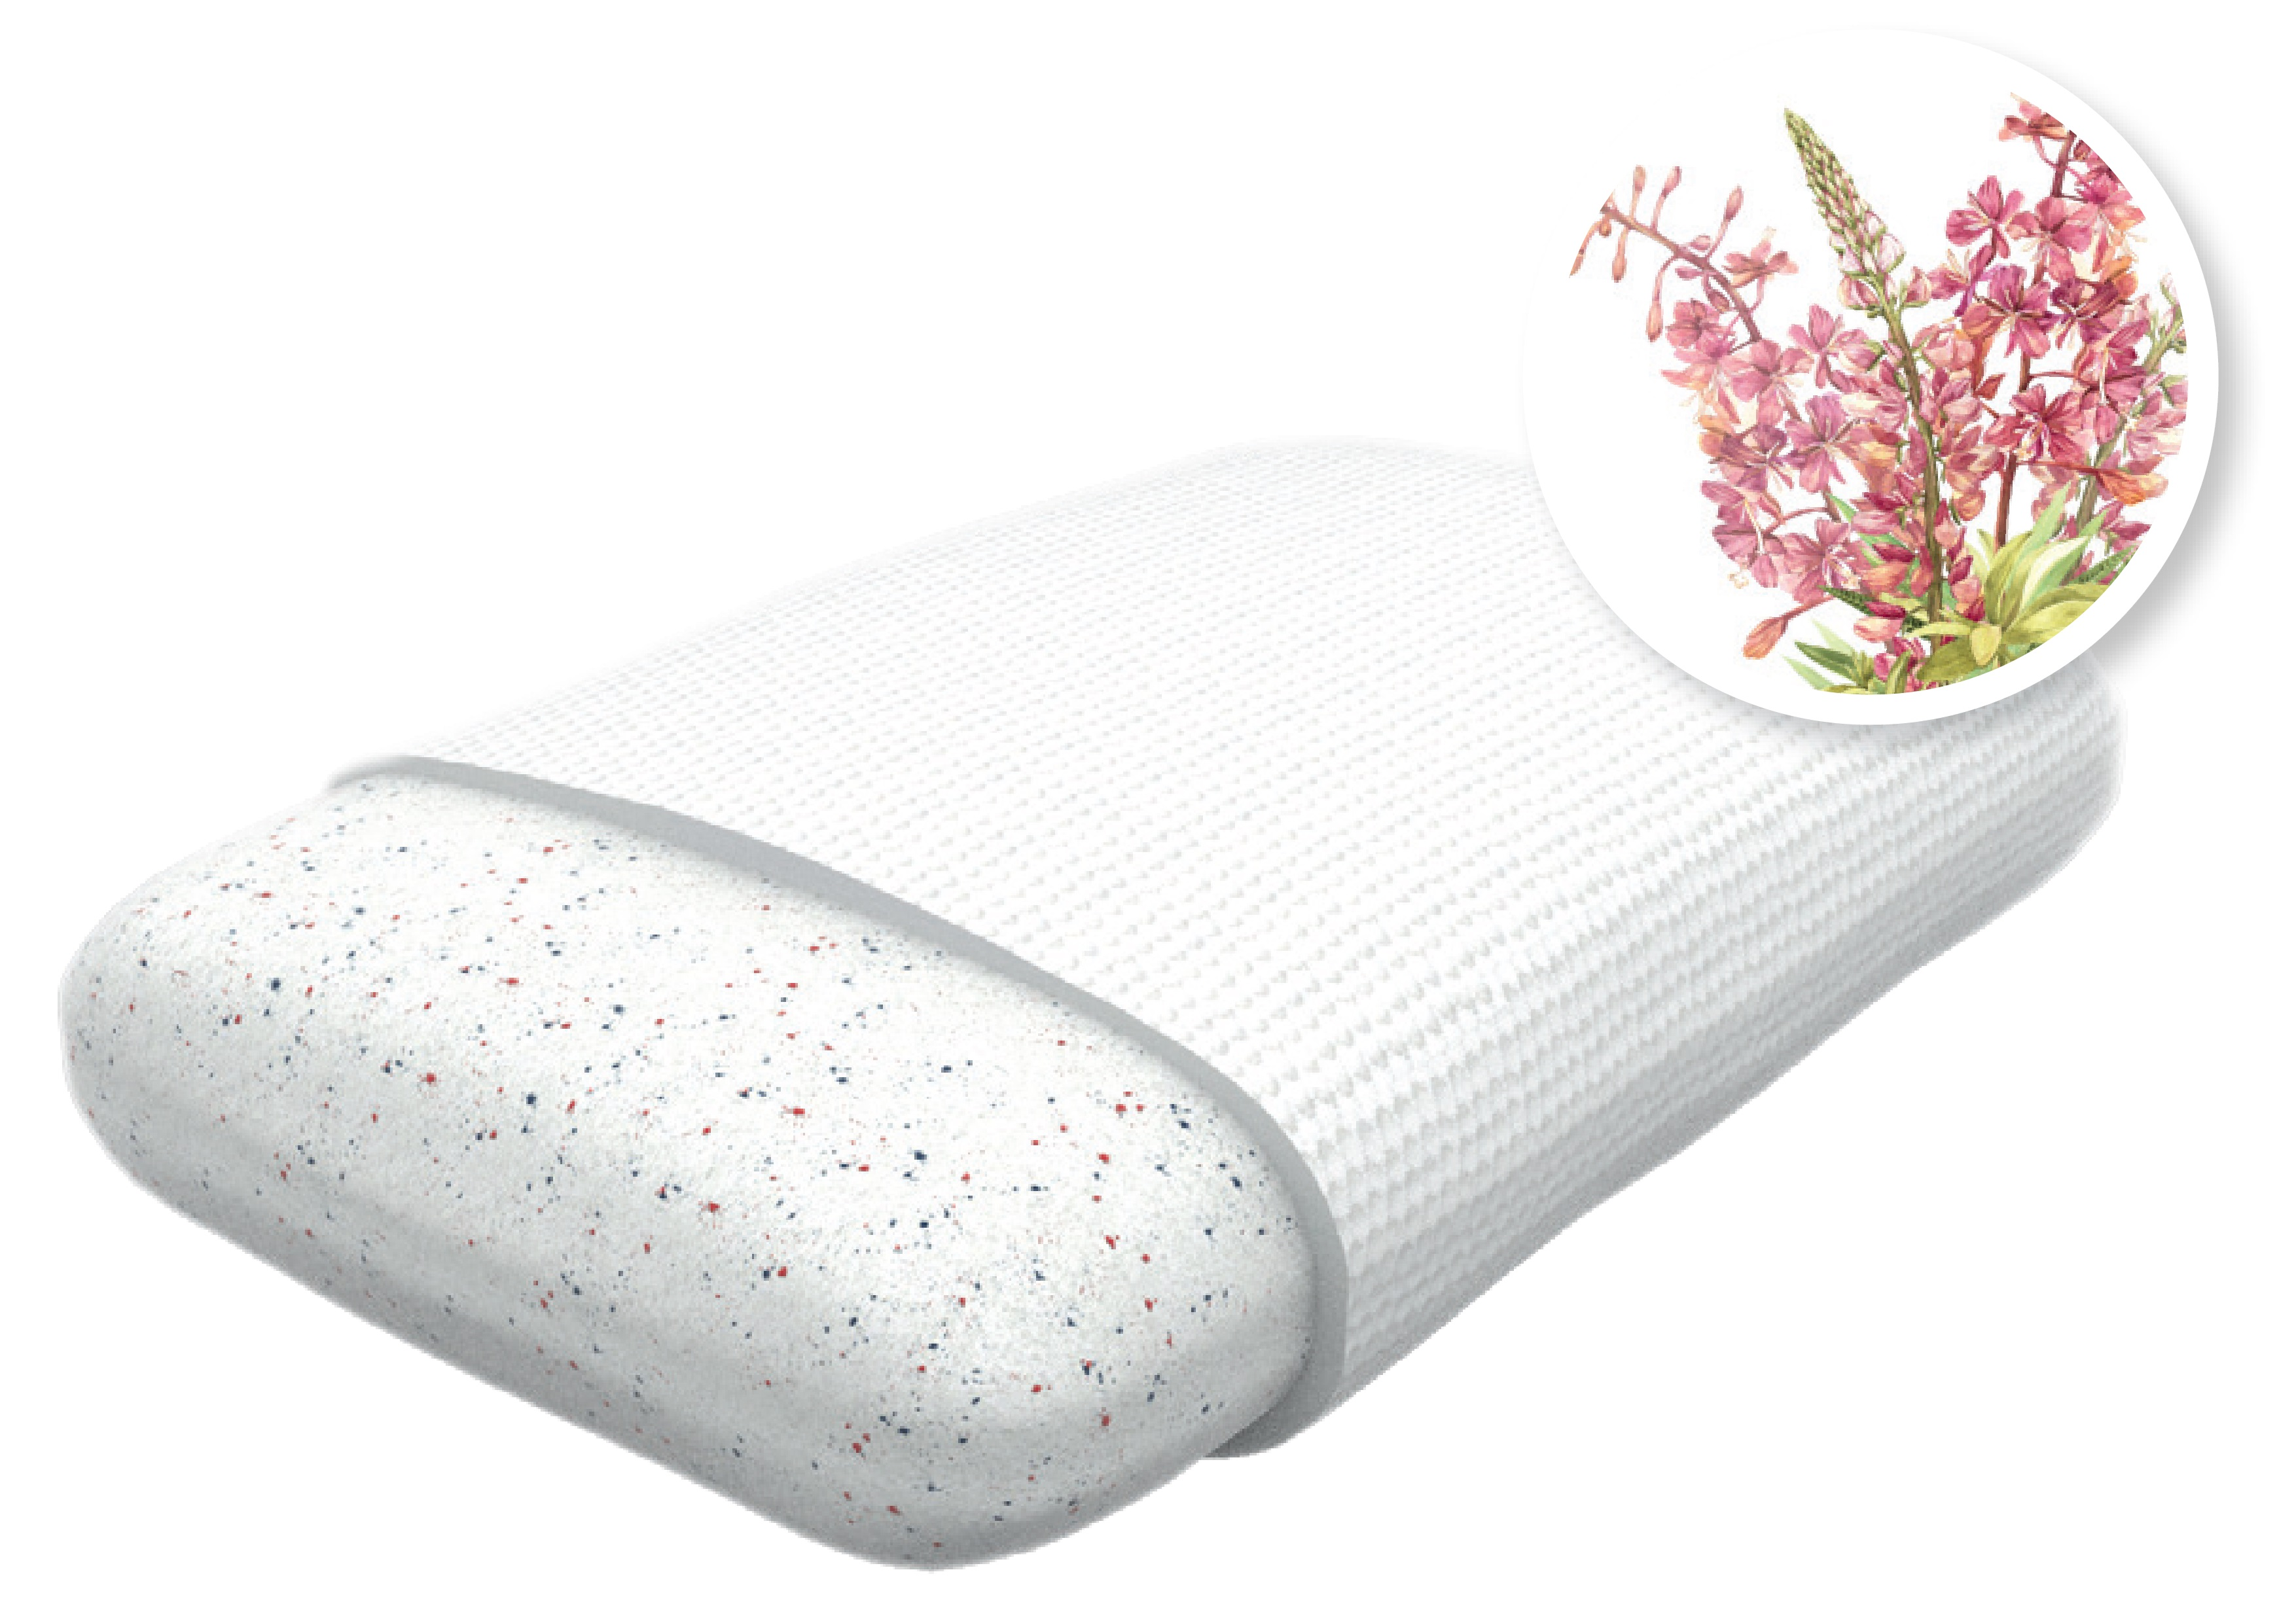 Подушки Revery Подушка Eternal Beauty (L) подушки fabe высокая подушка с памятью формы memo classic 16